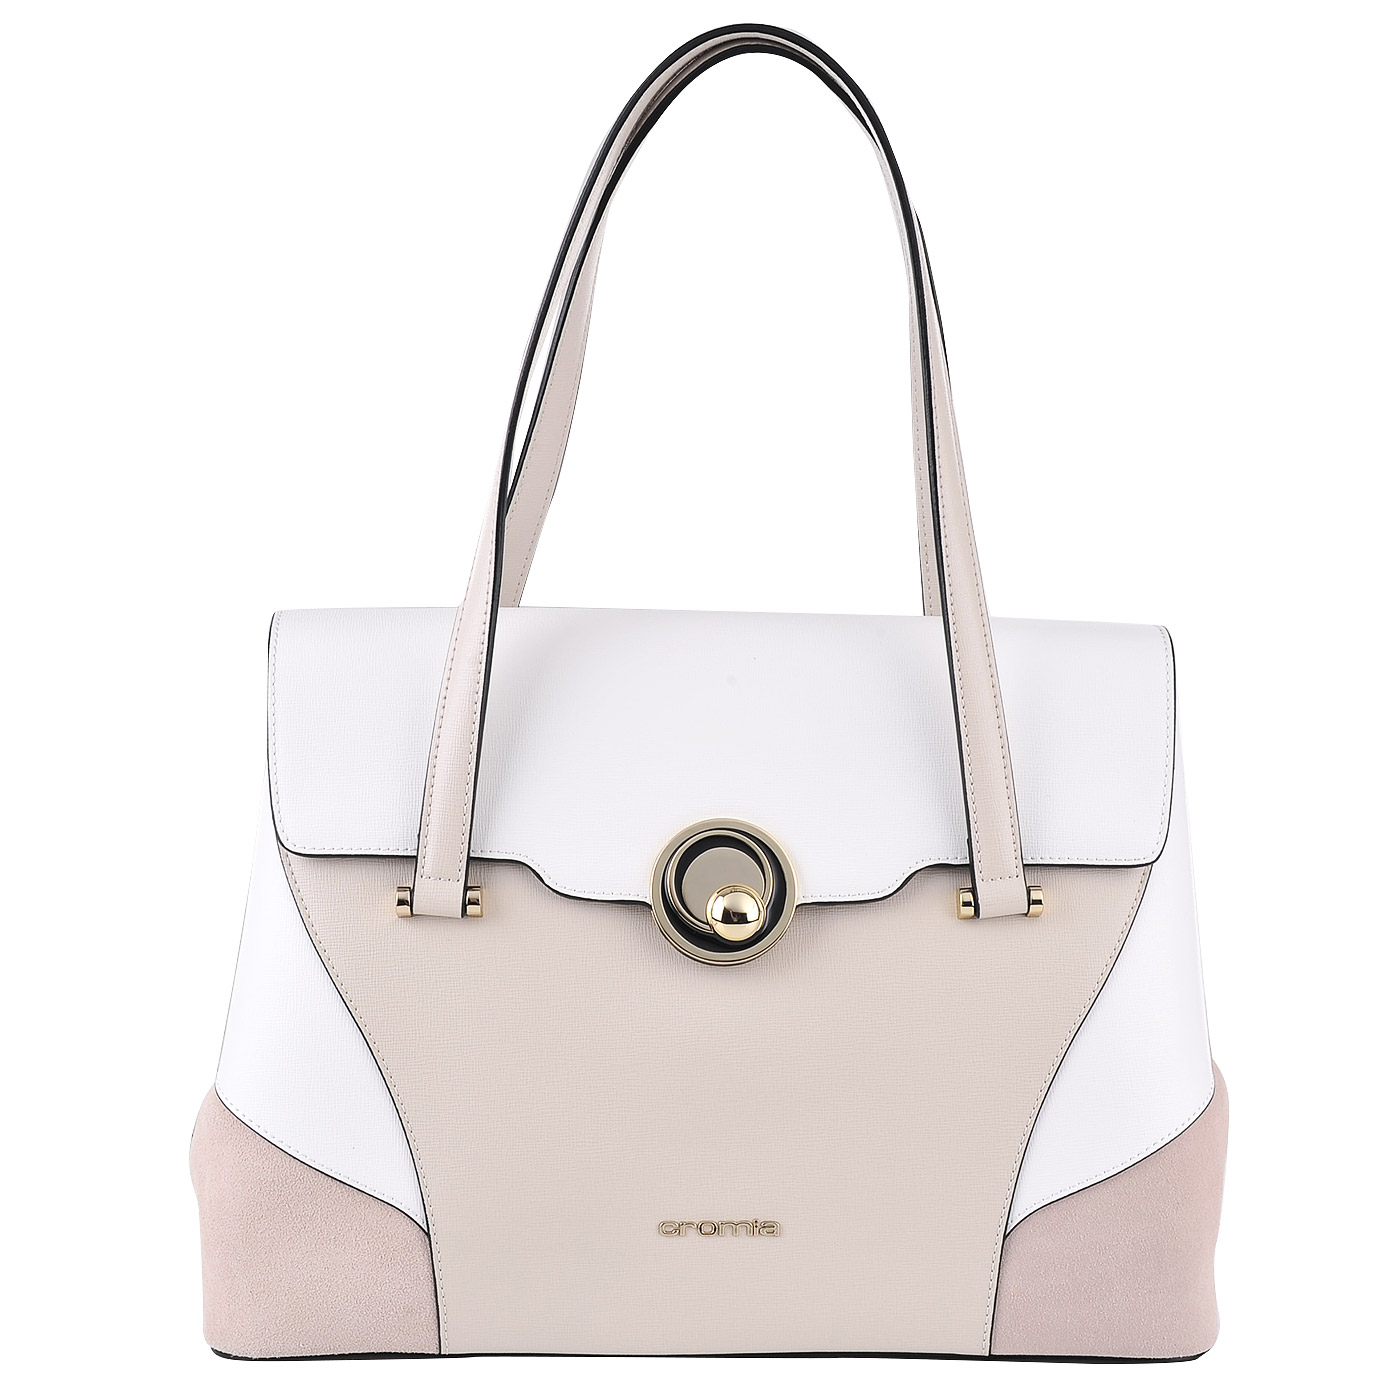 793b03162aec Женская кожаная сумка Cromia Stella 1403207_avorio/bianco/rosa ...